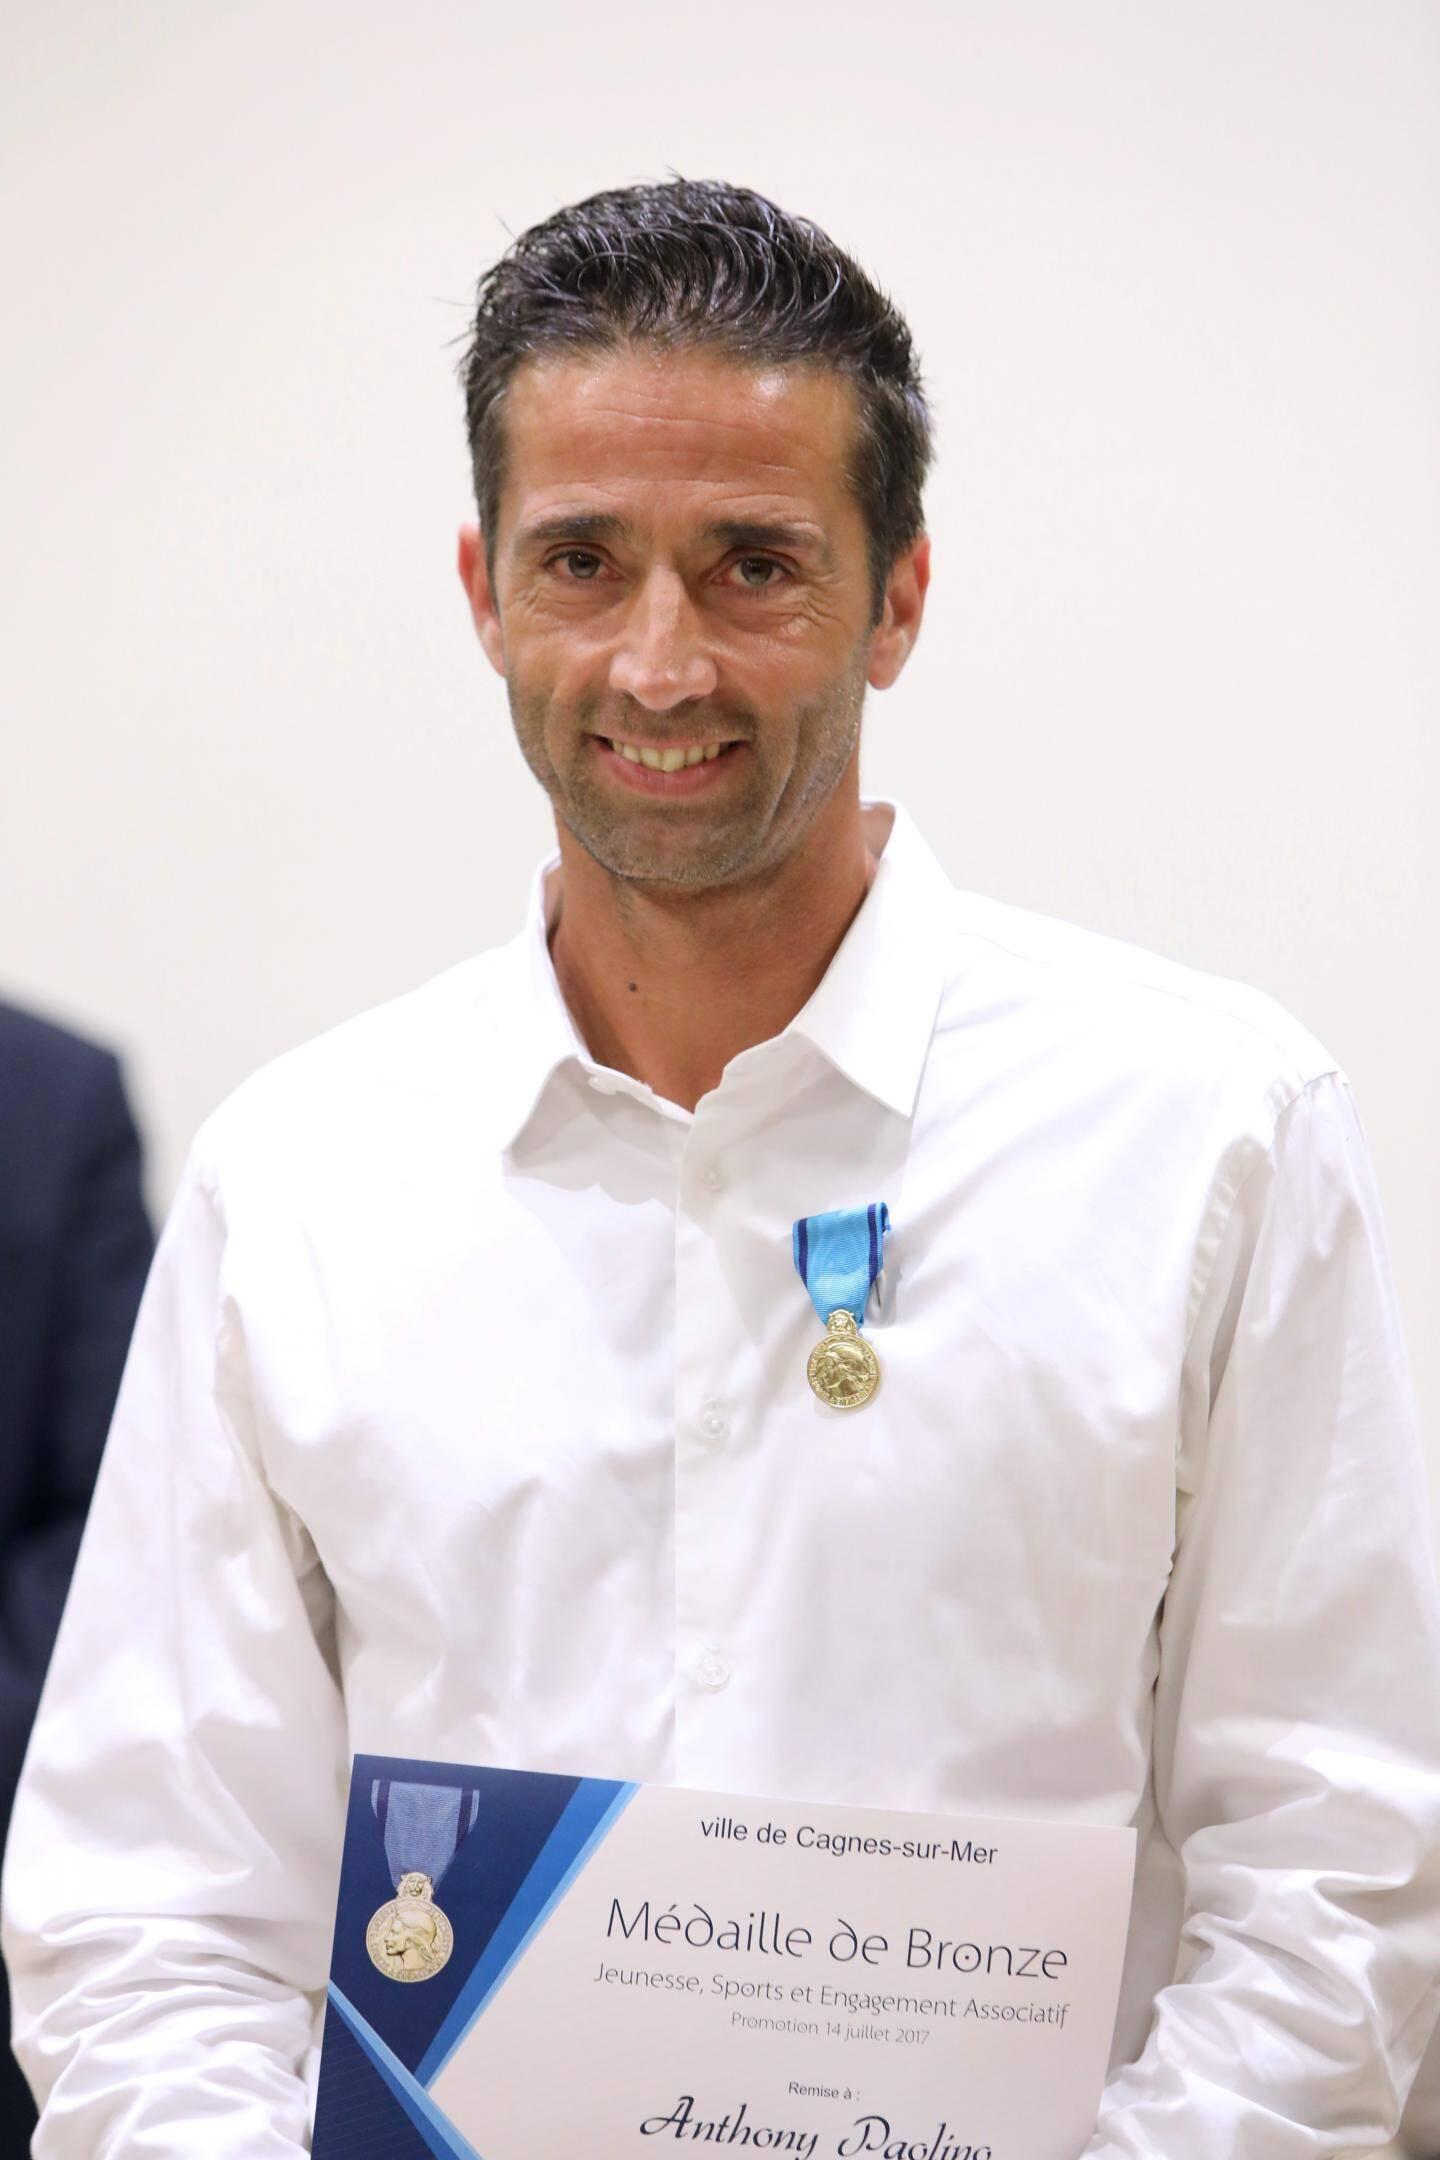 Anthony Paolino, ASCC football : BRONZE